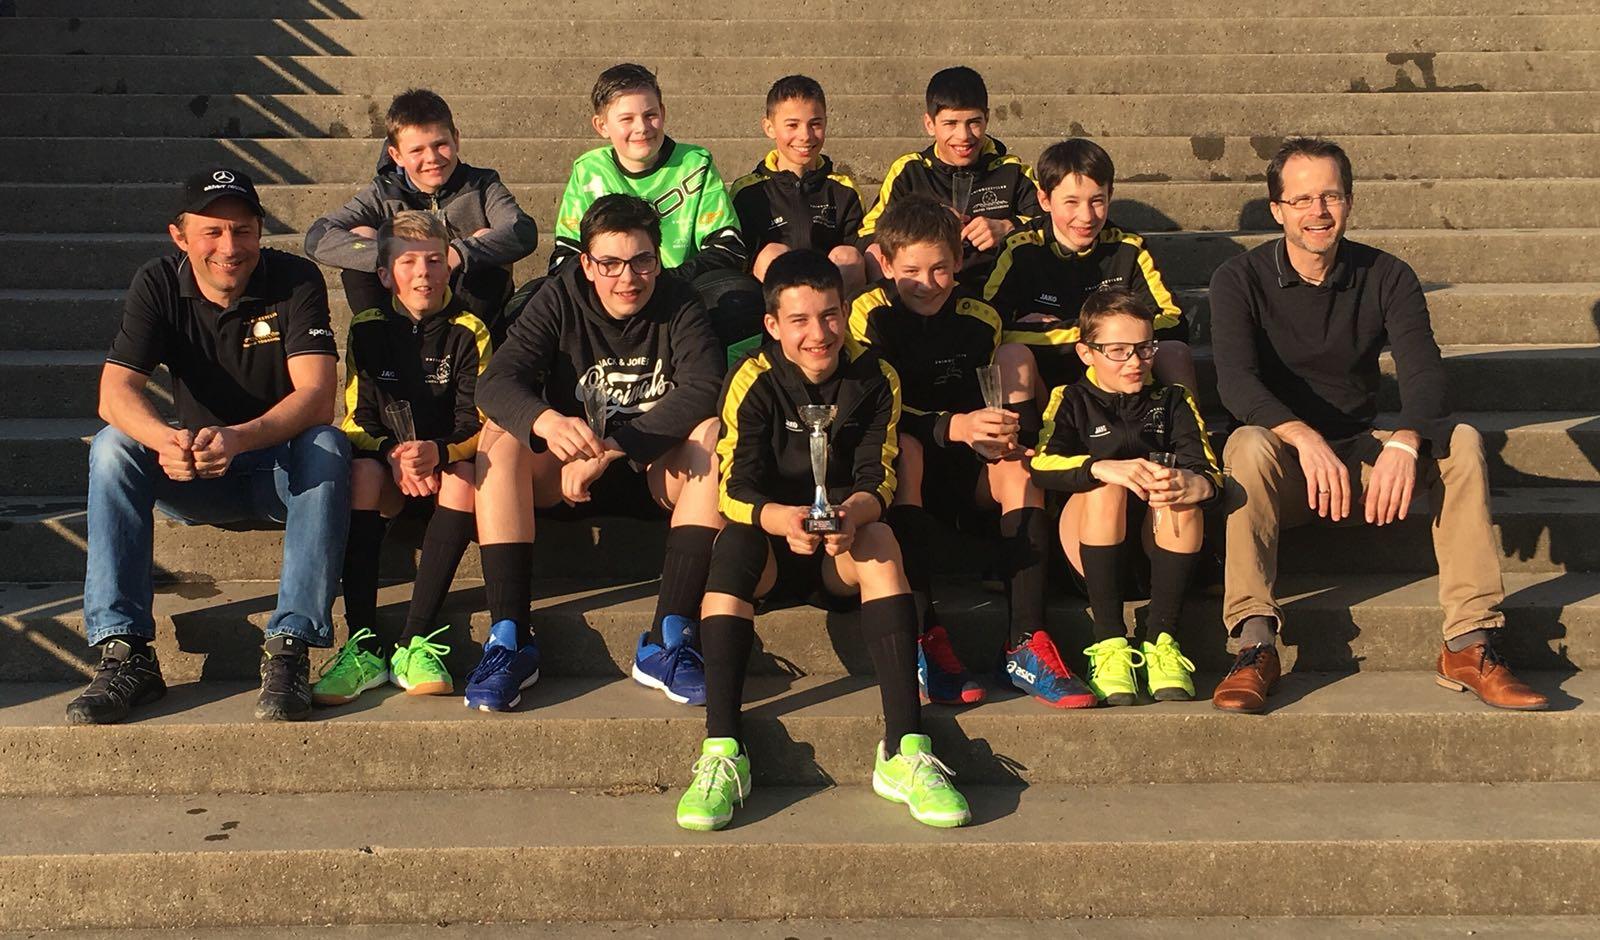 Teamfoto Junioren C Wattwil 2017-18